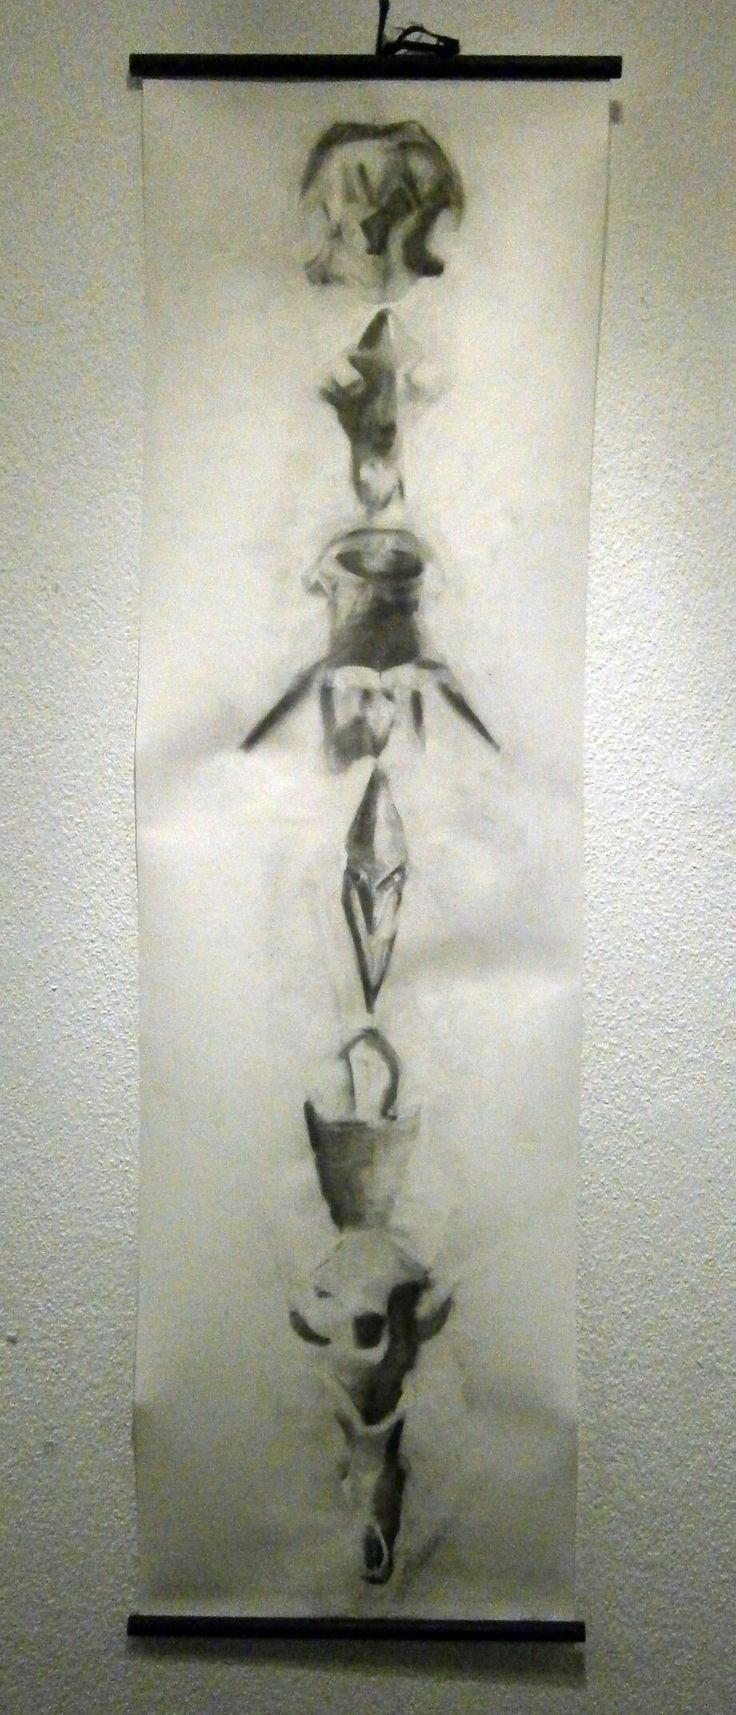 Totem, carboncillo sobre papel engesado, 2014, Gabriel Bretone